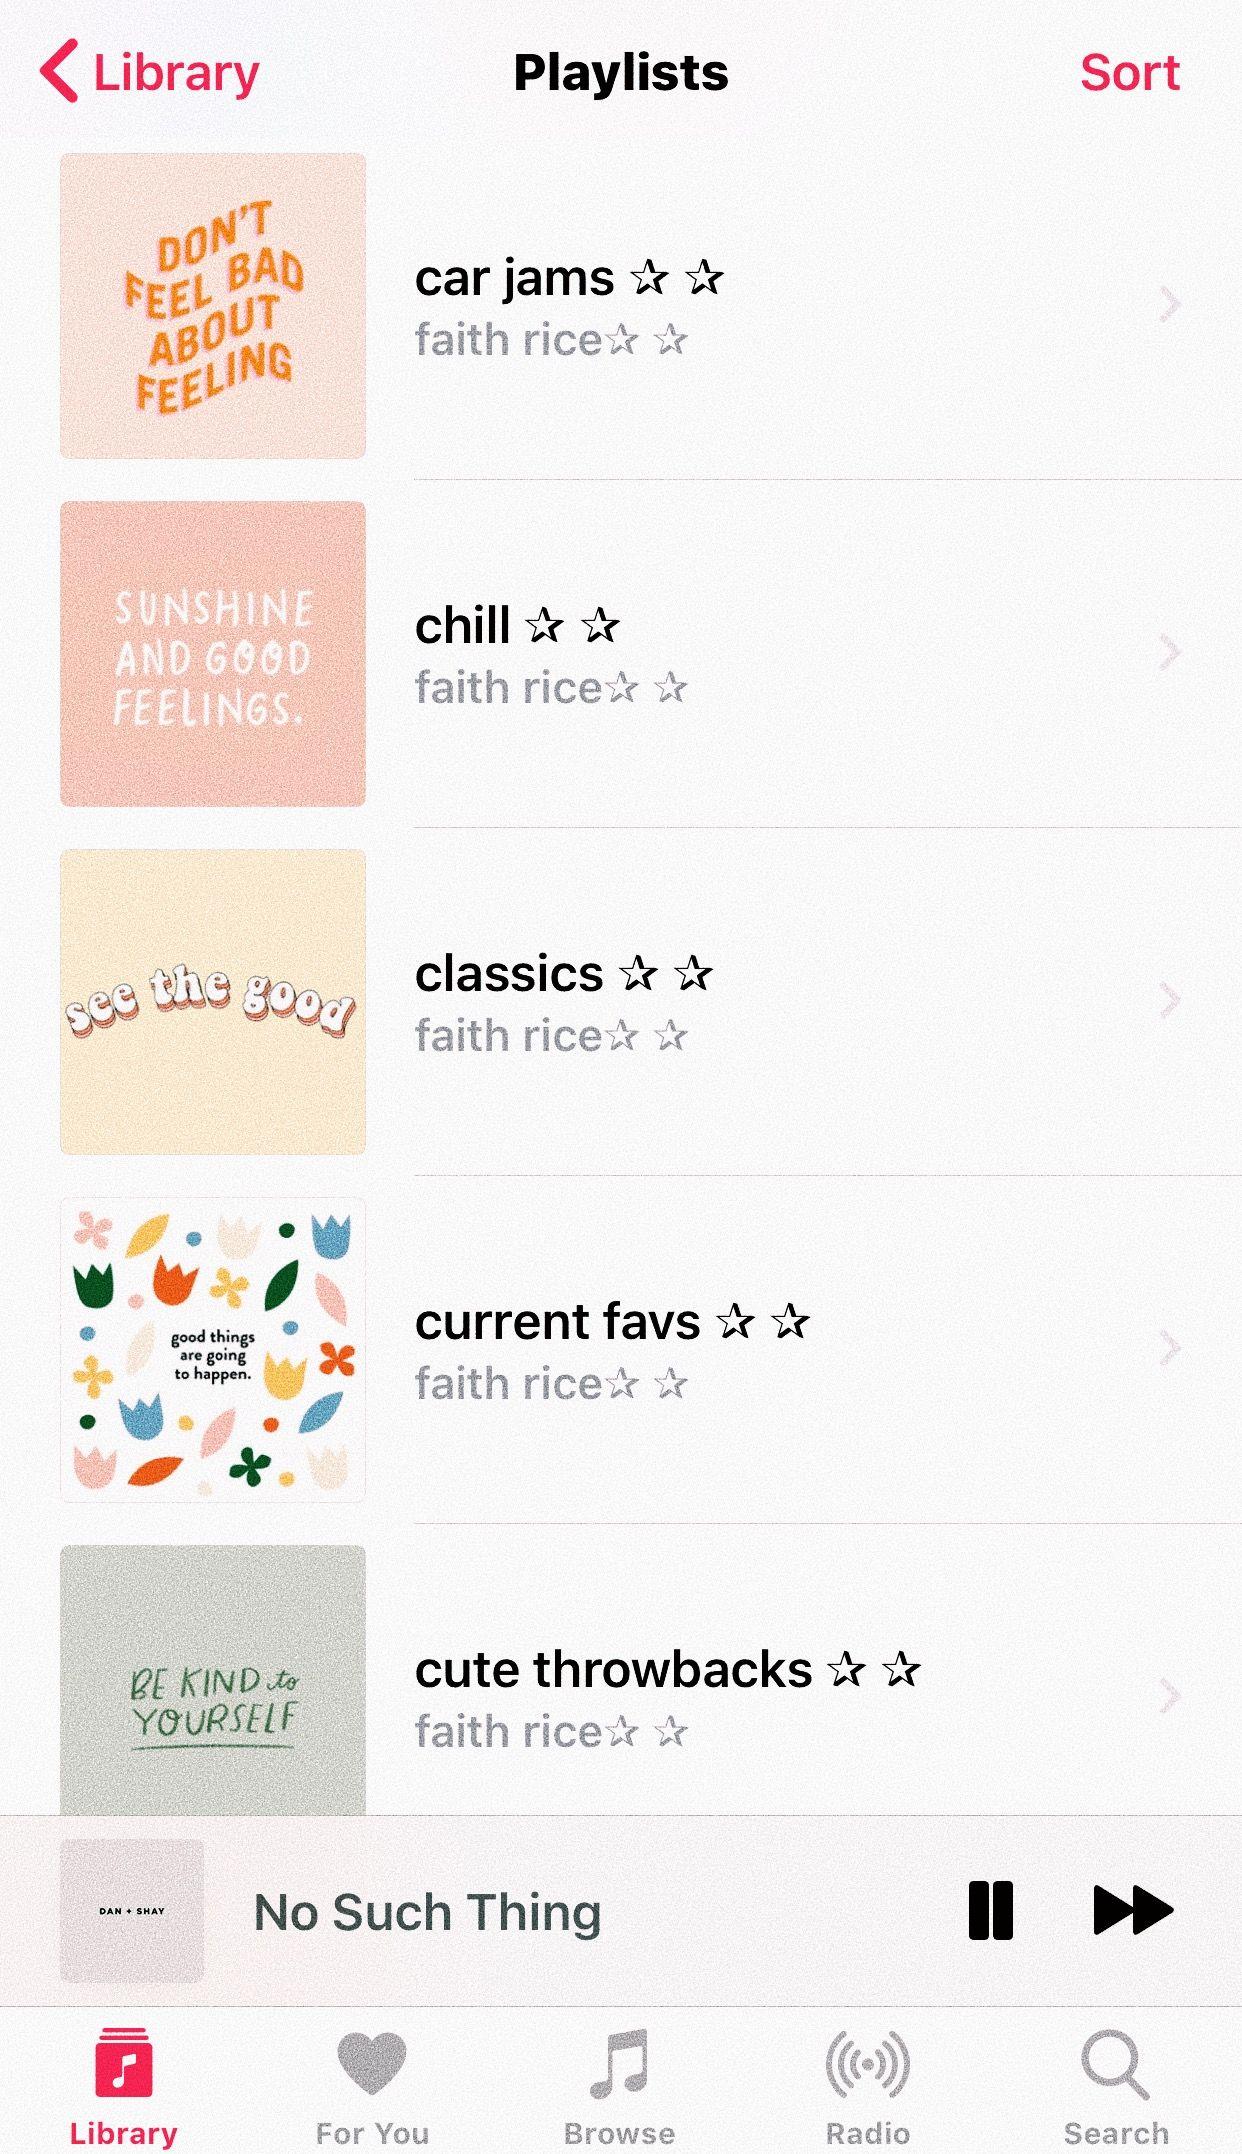 Apple Music Faithrice6 Spotify Playlist Covers Artsy Vsco Album